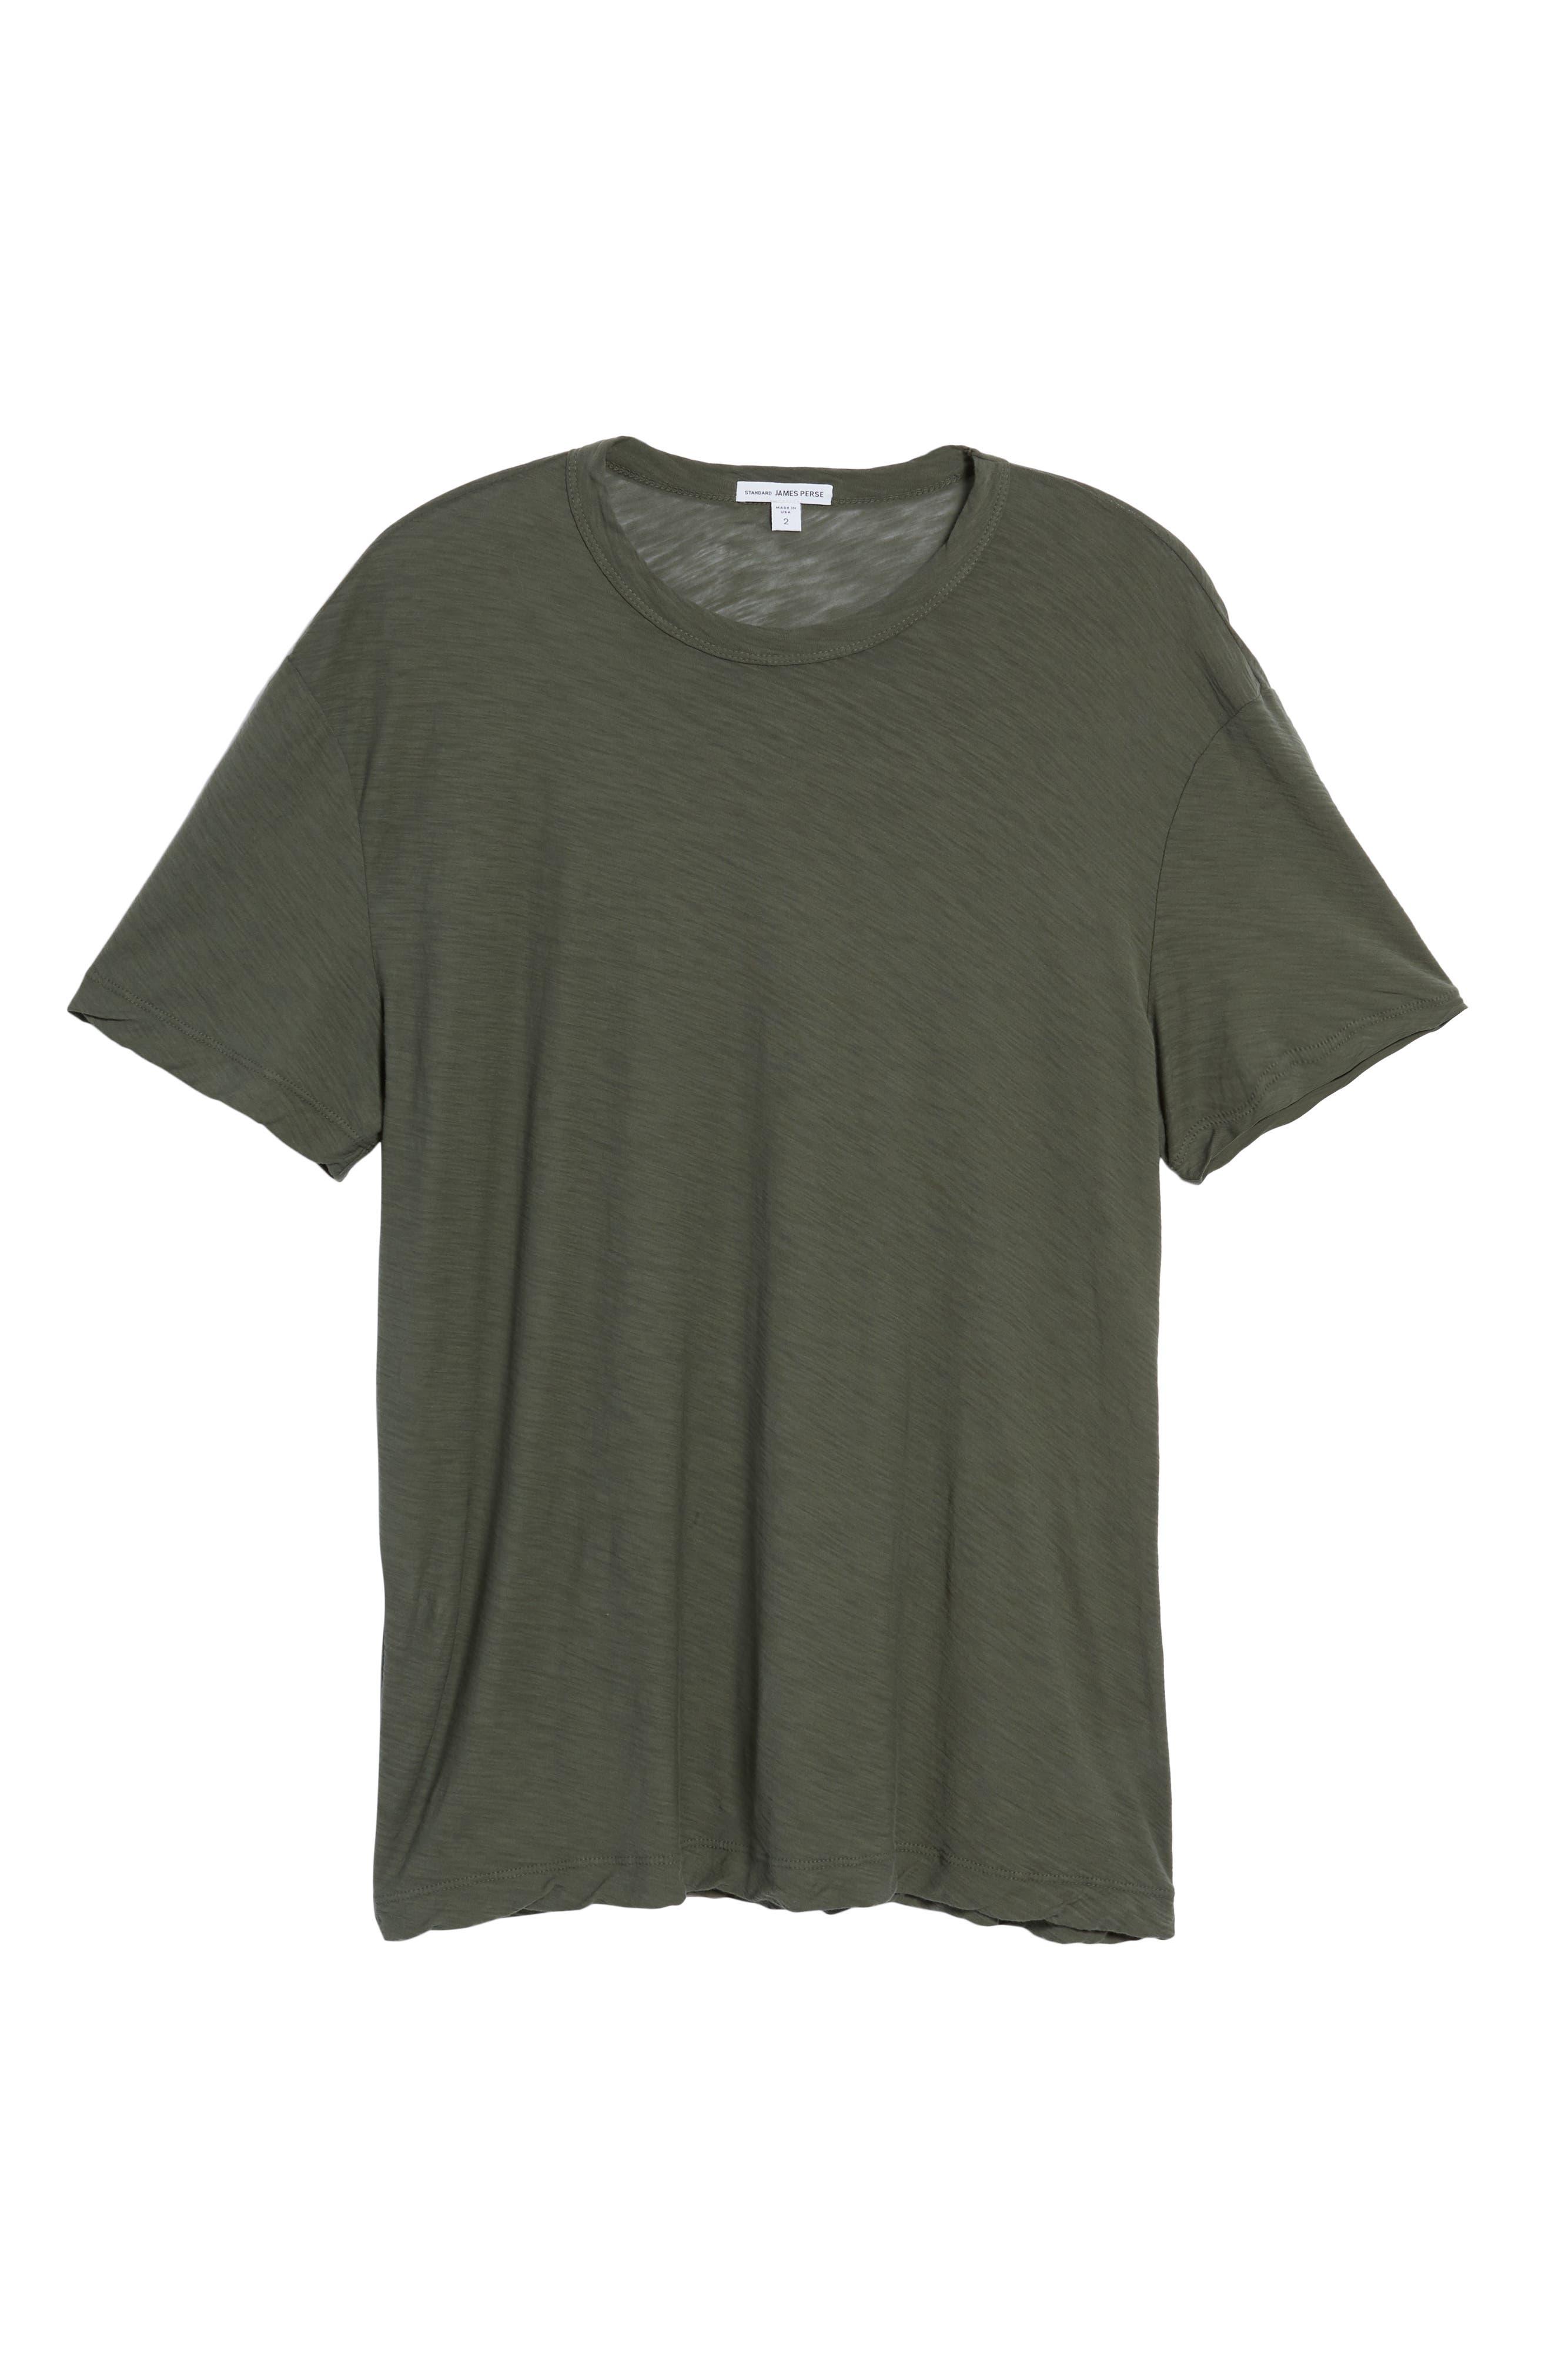 Regular Fit Shirt,                             Alternate thumbnail 6, color,                             304